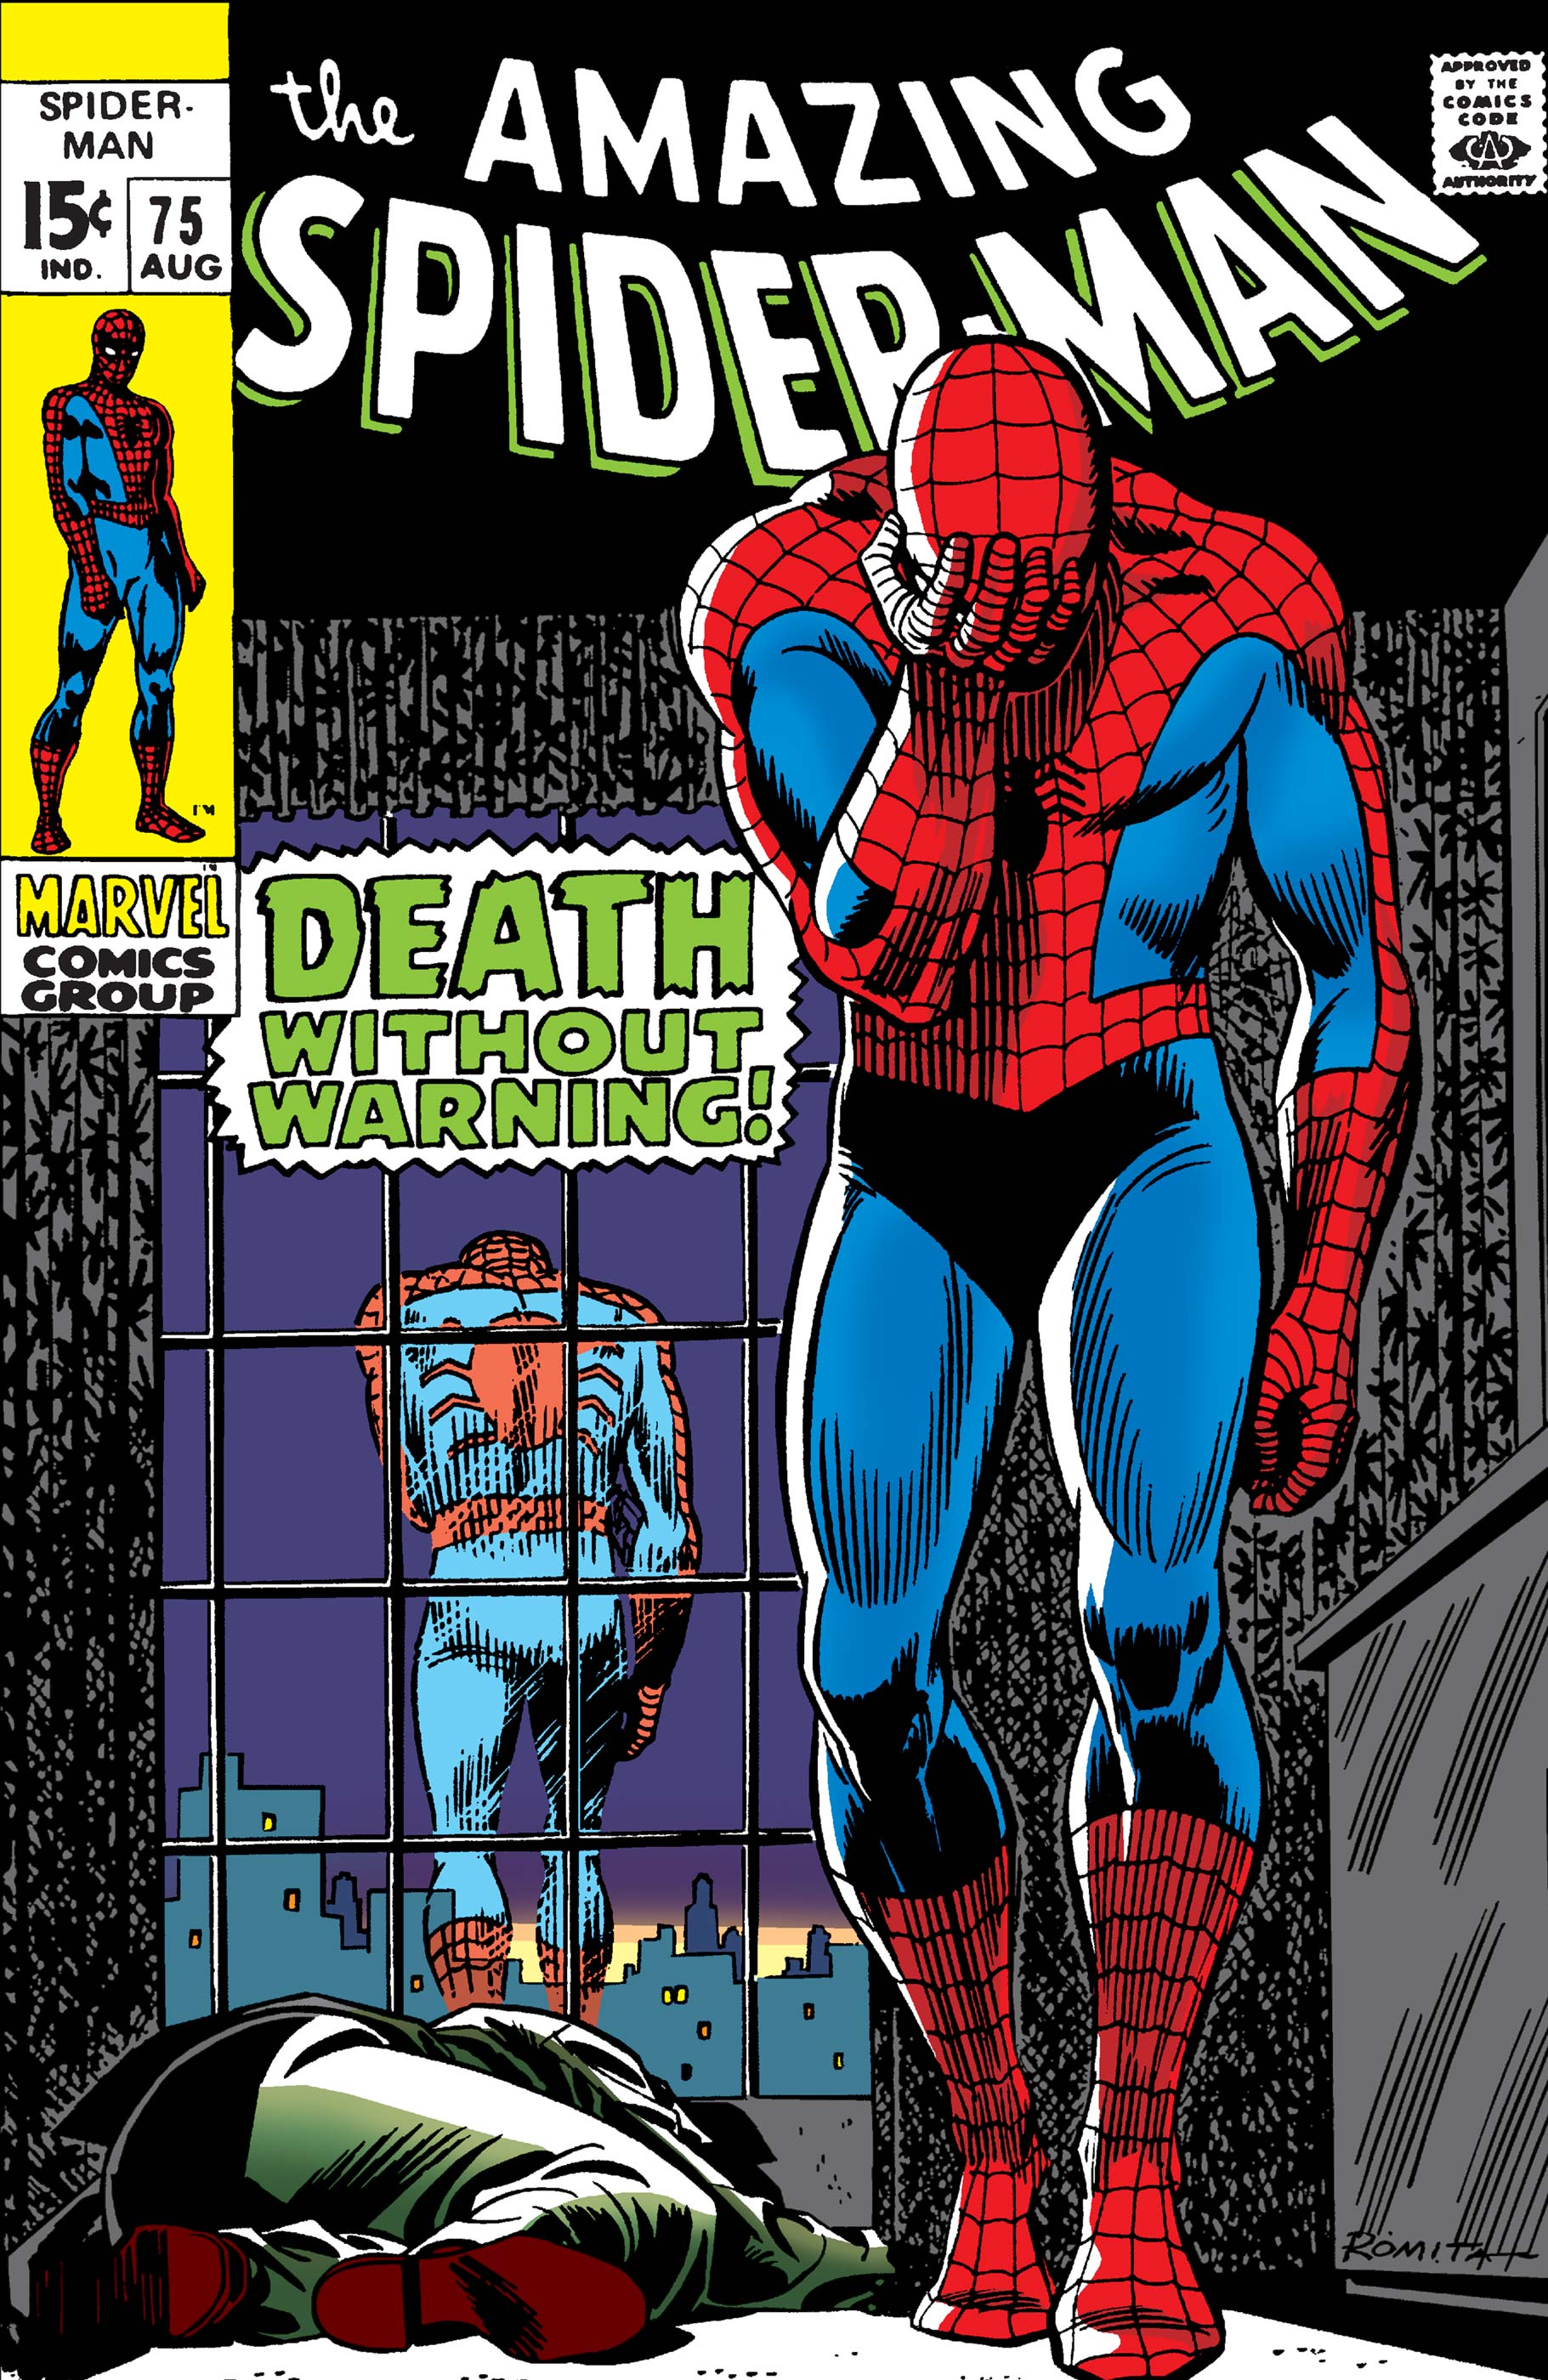 The Amazing Spider-Man (1963) #75